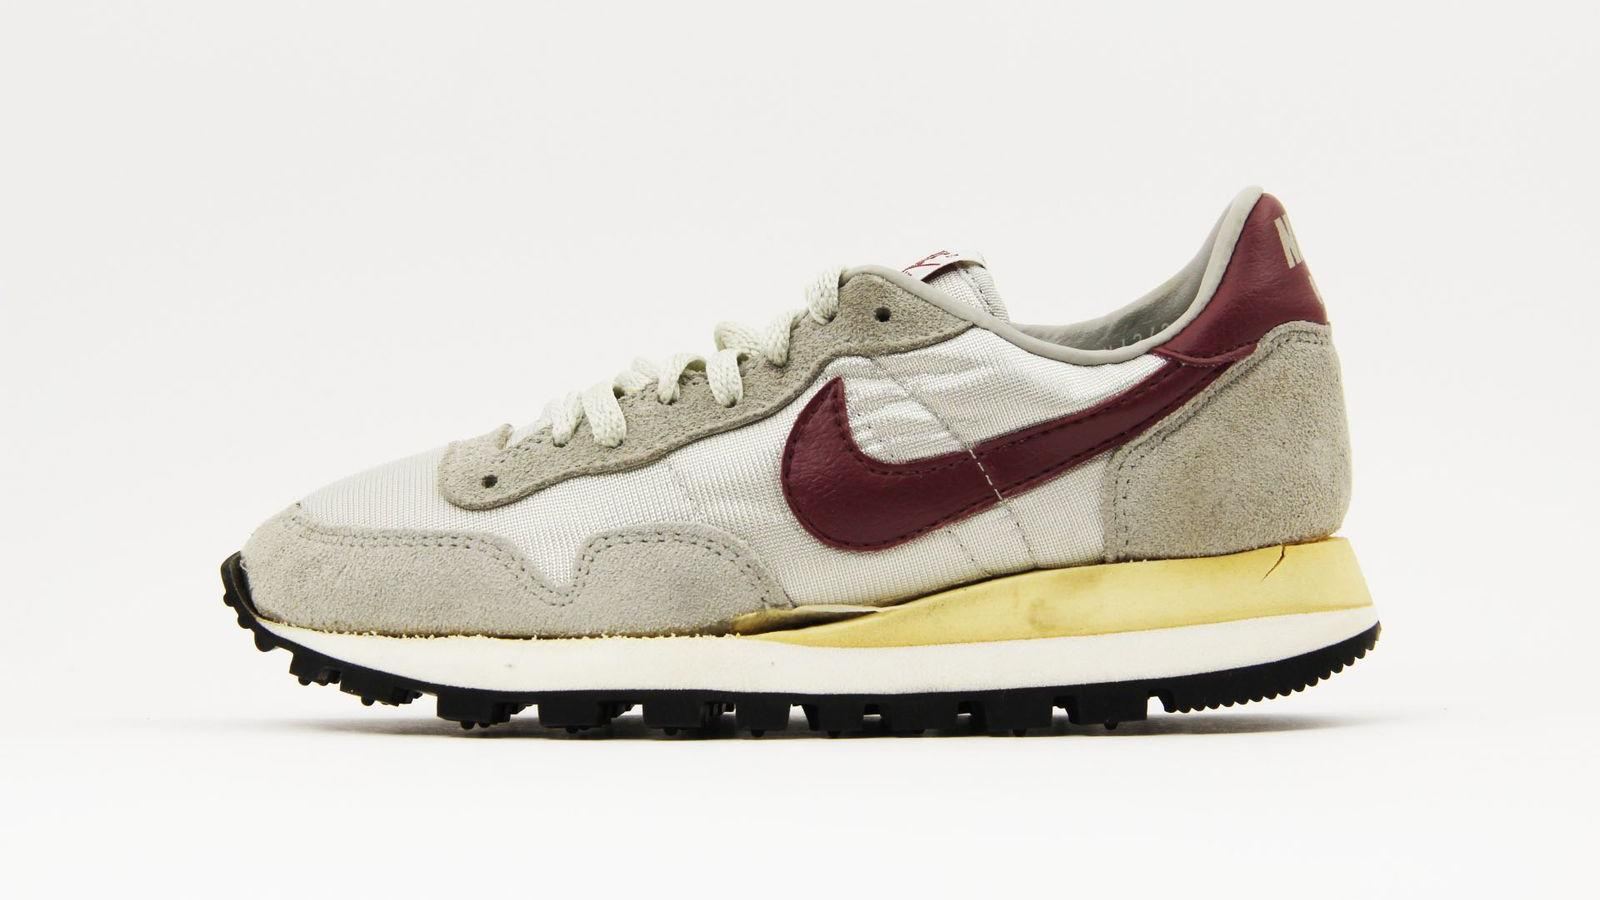 Nike Pegasus mujer 1983